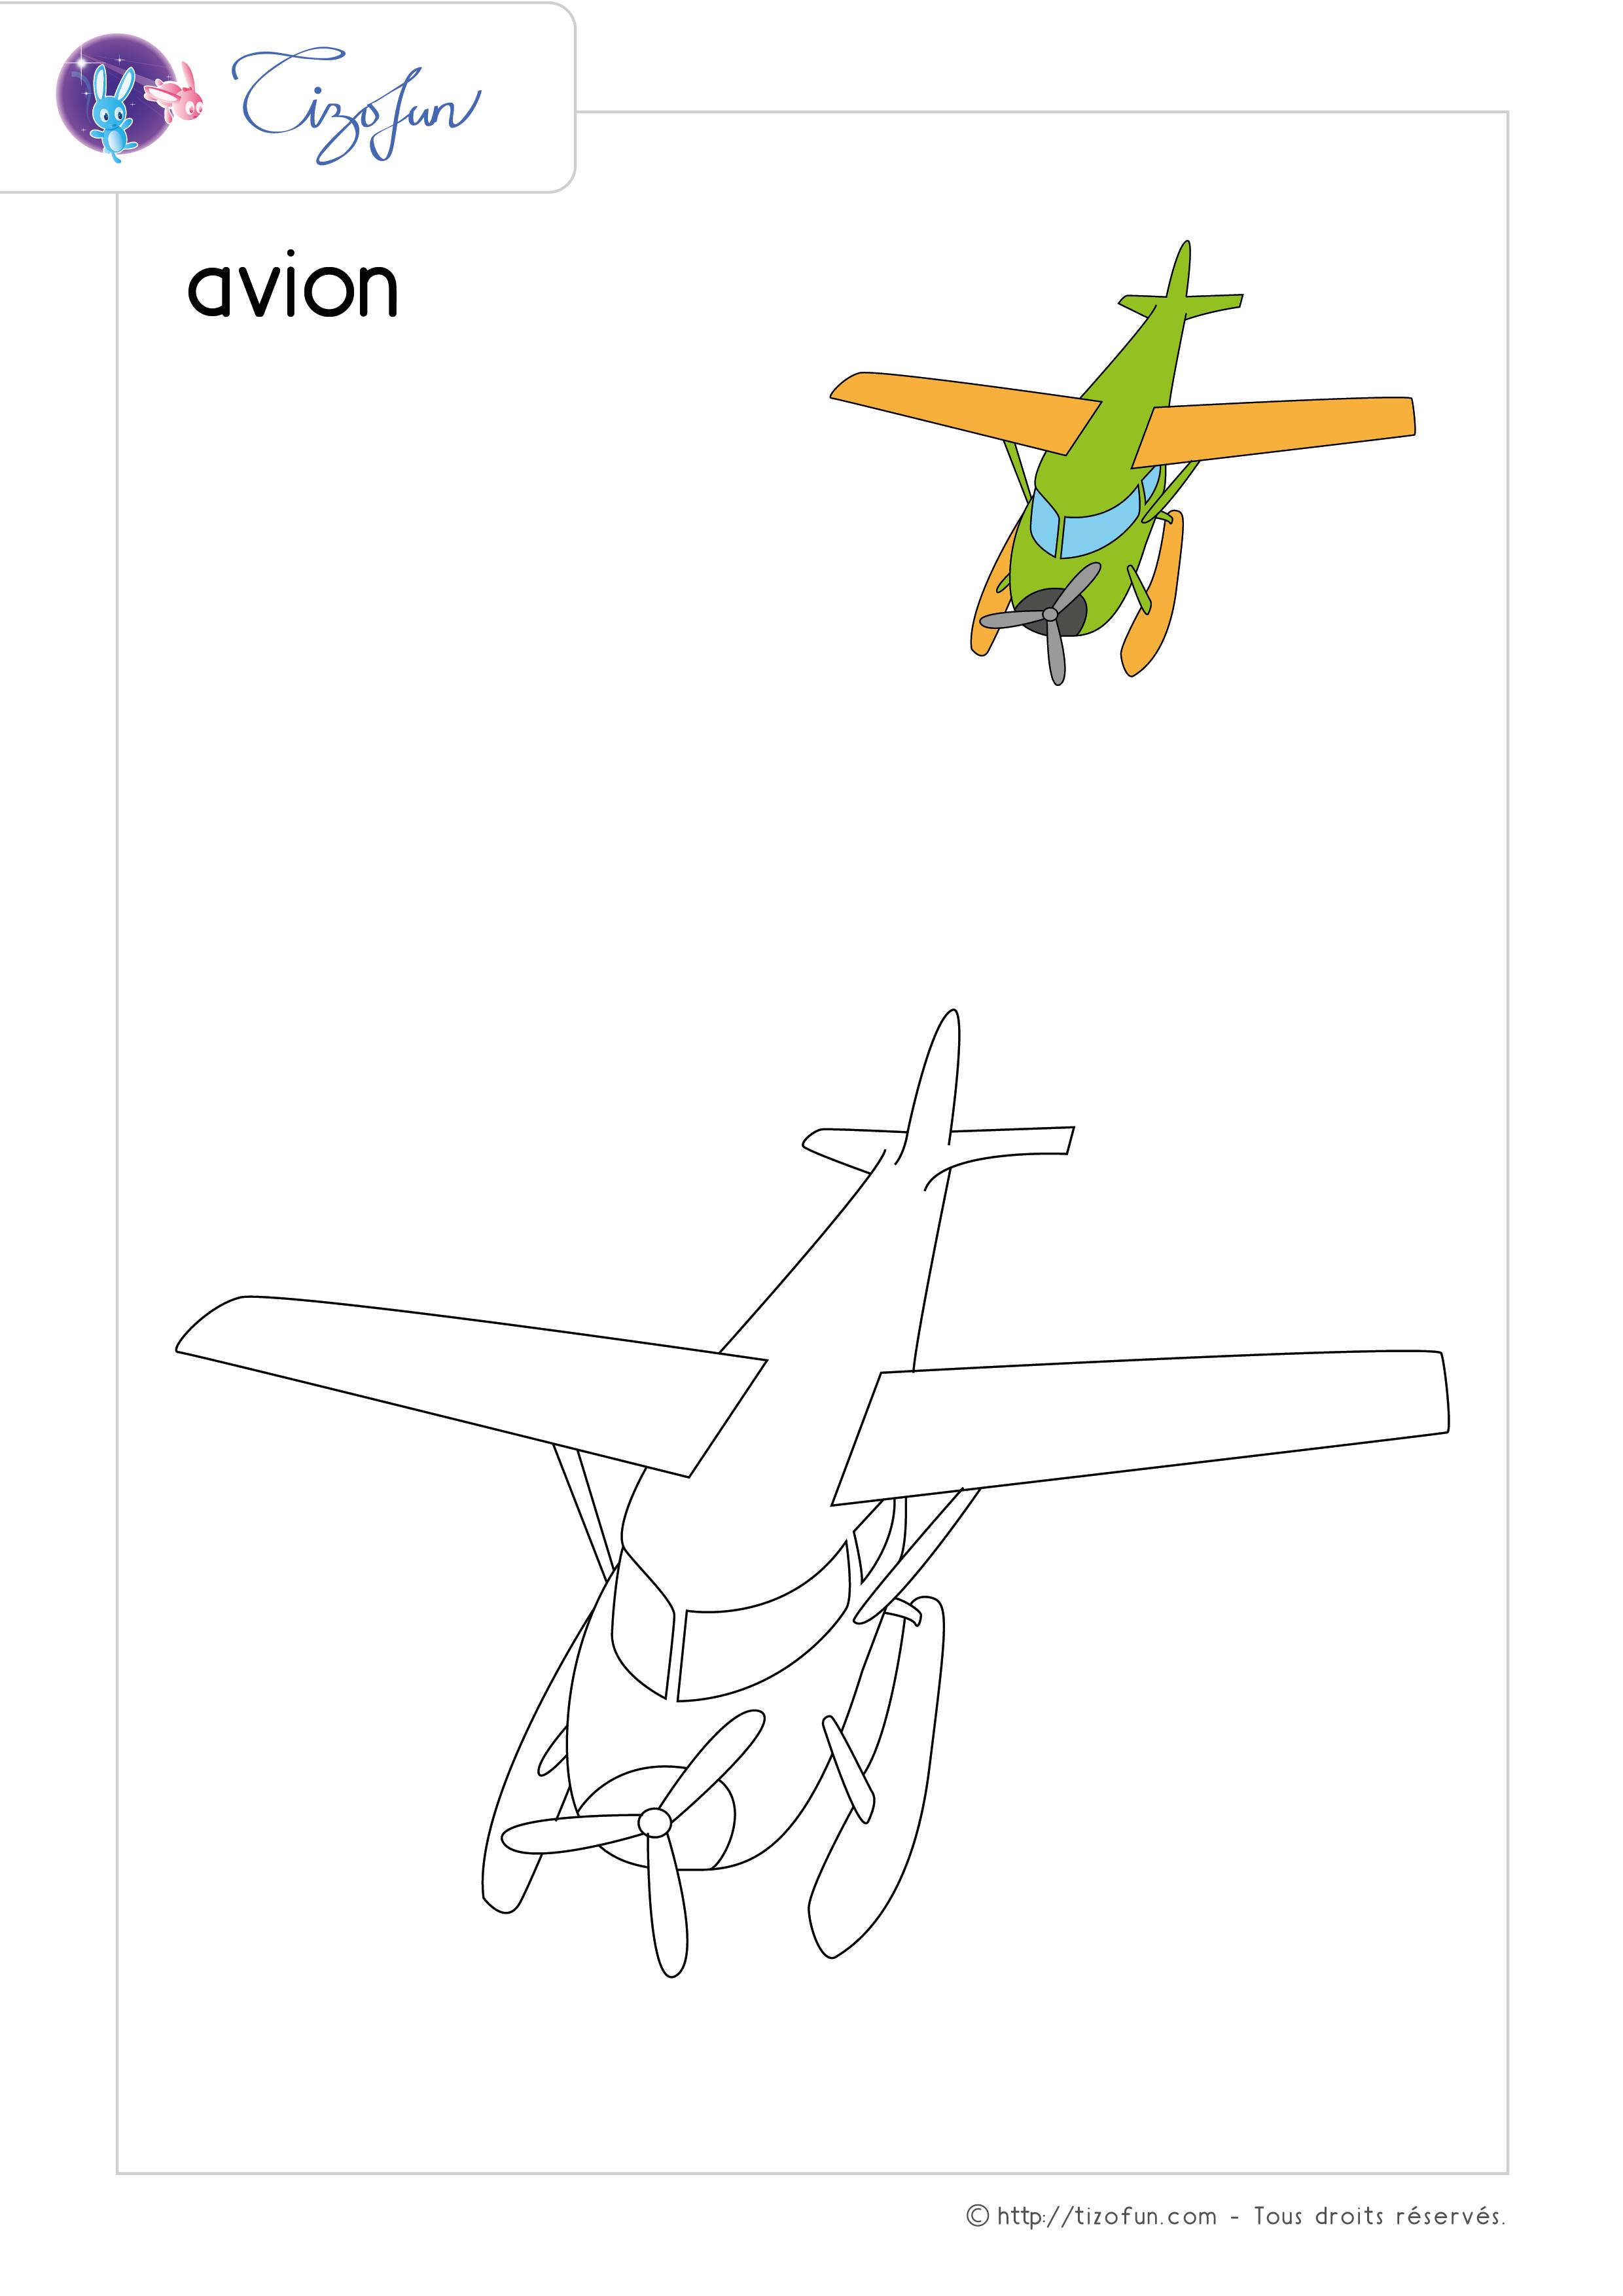 Coloriages Avion Apanageet Com